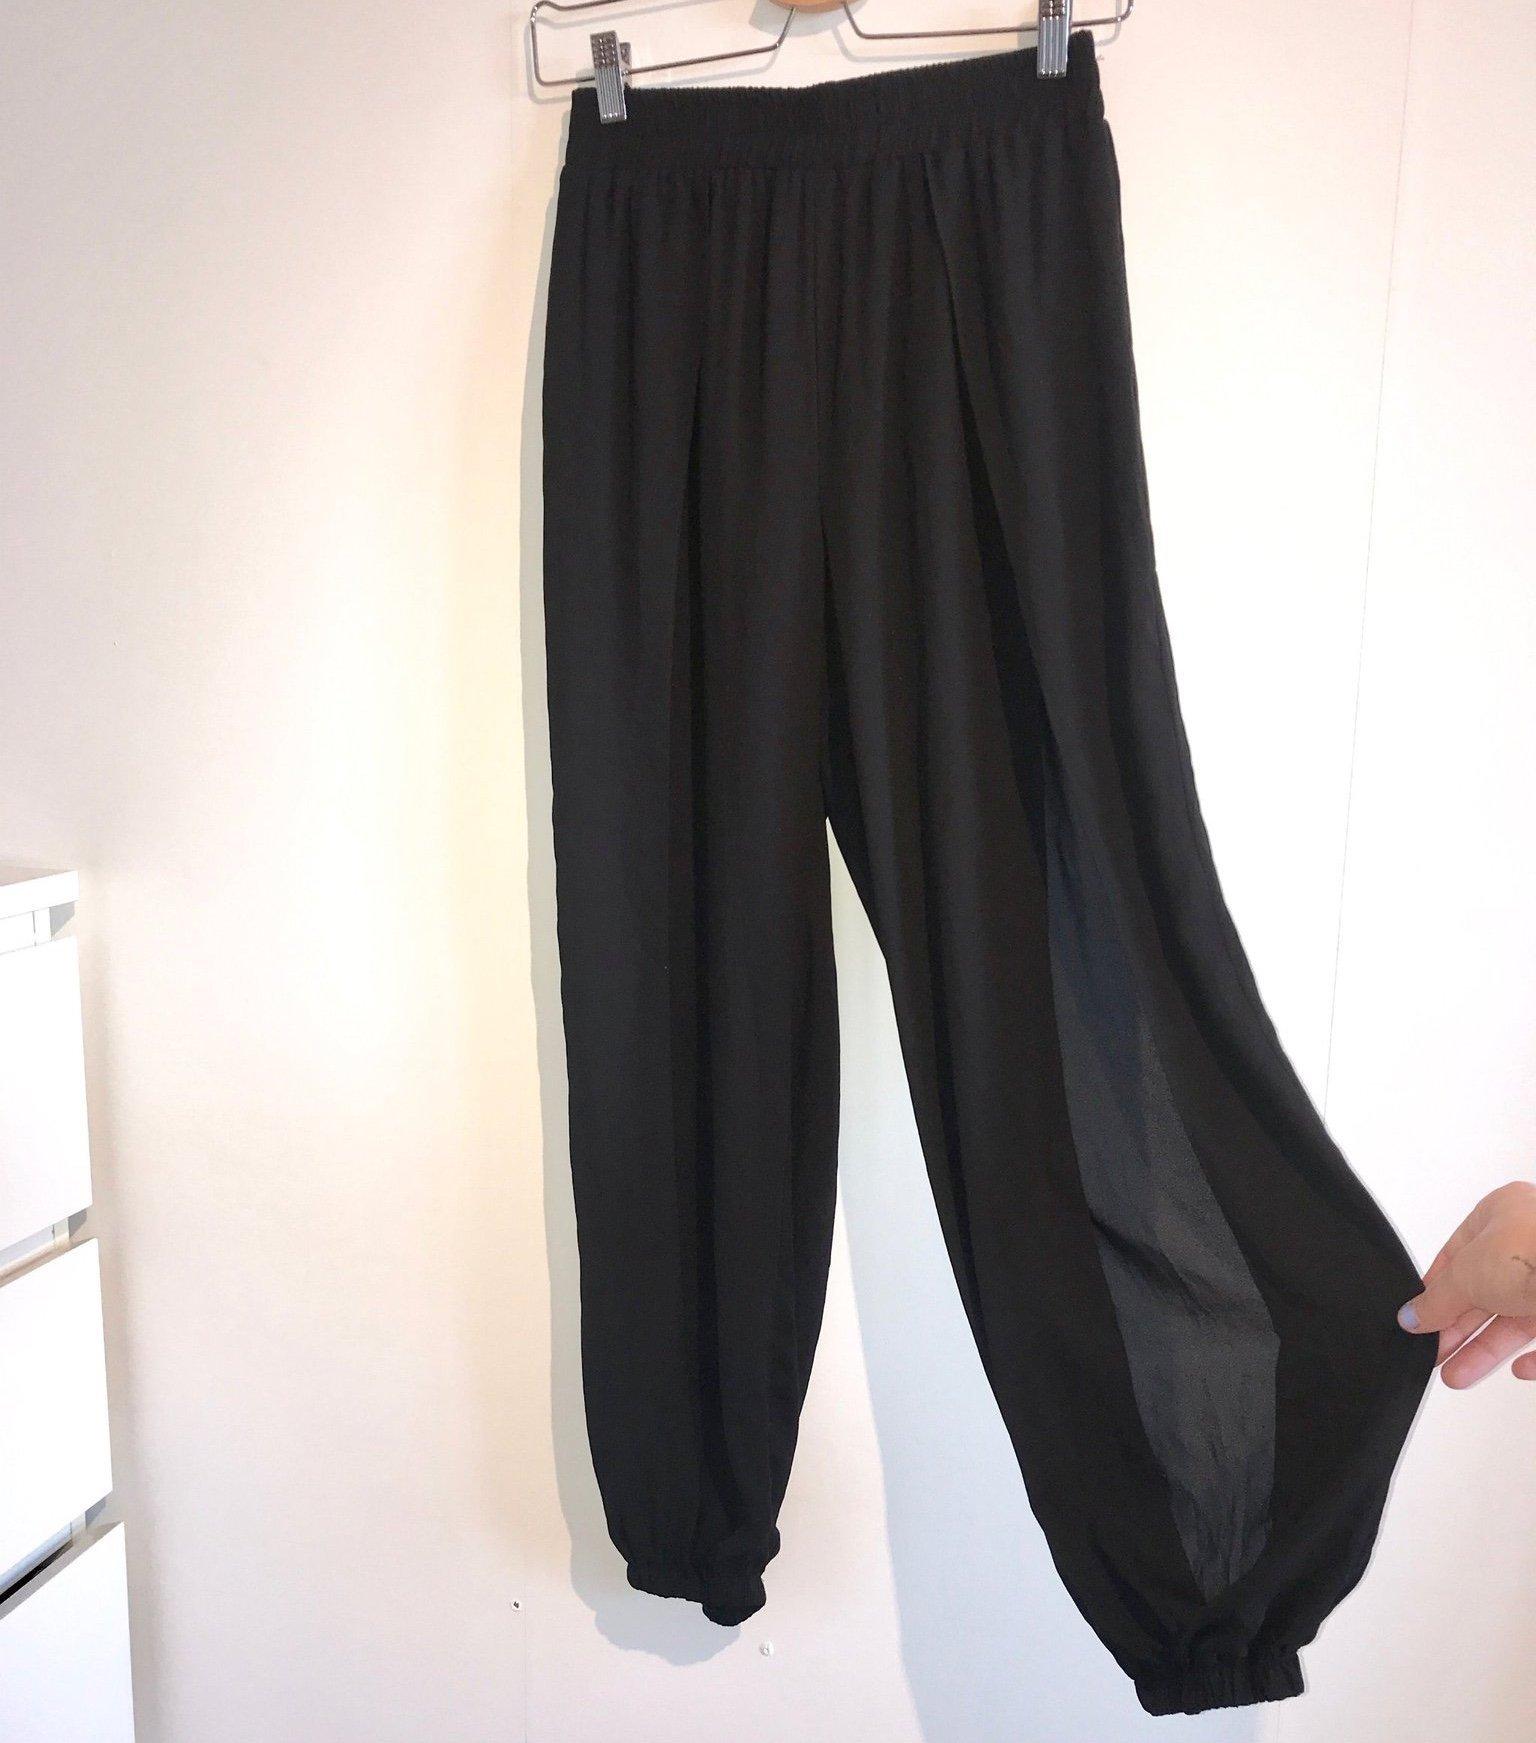 svarta byxor med slits fram